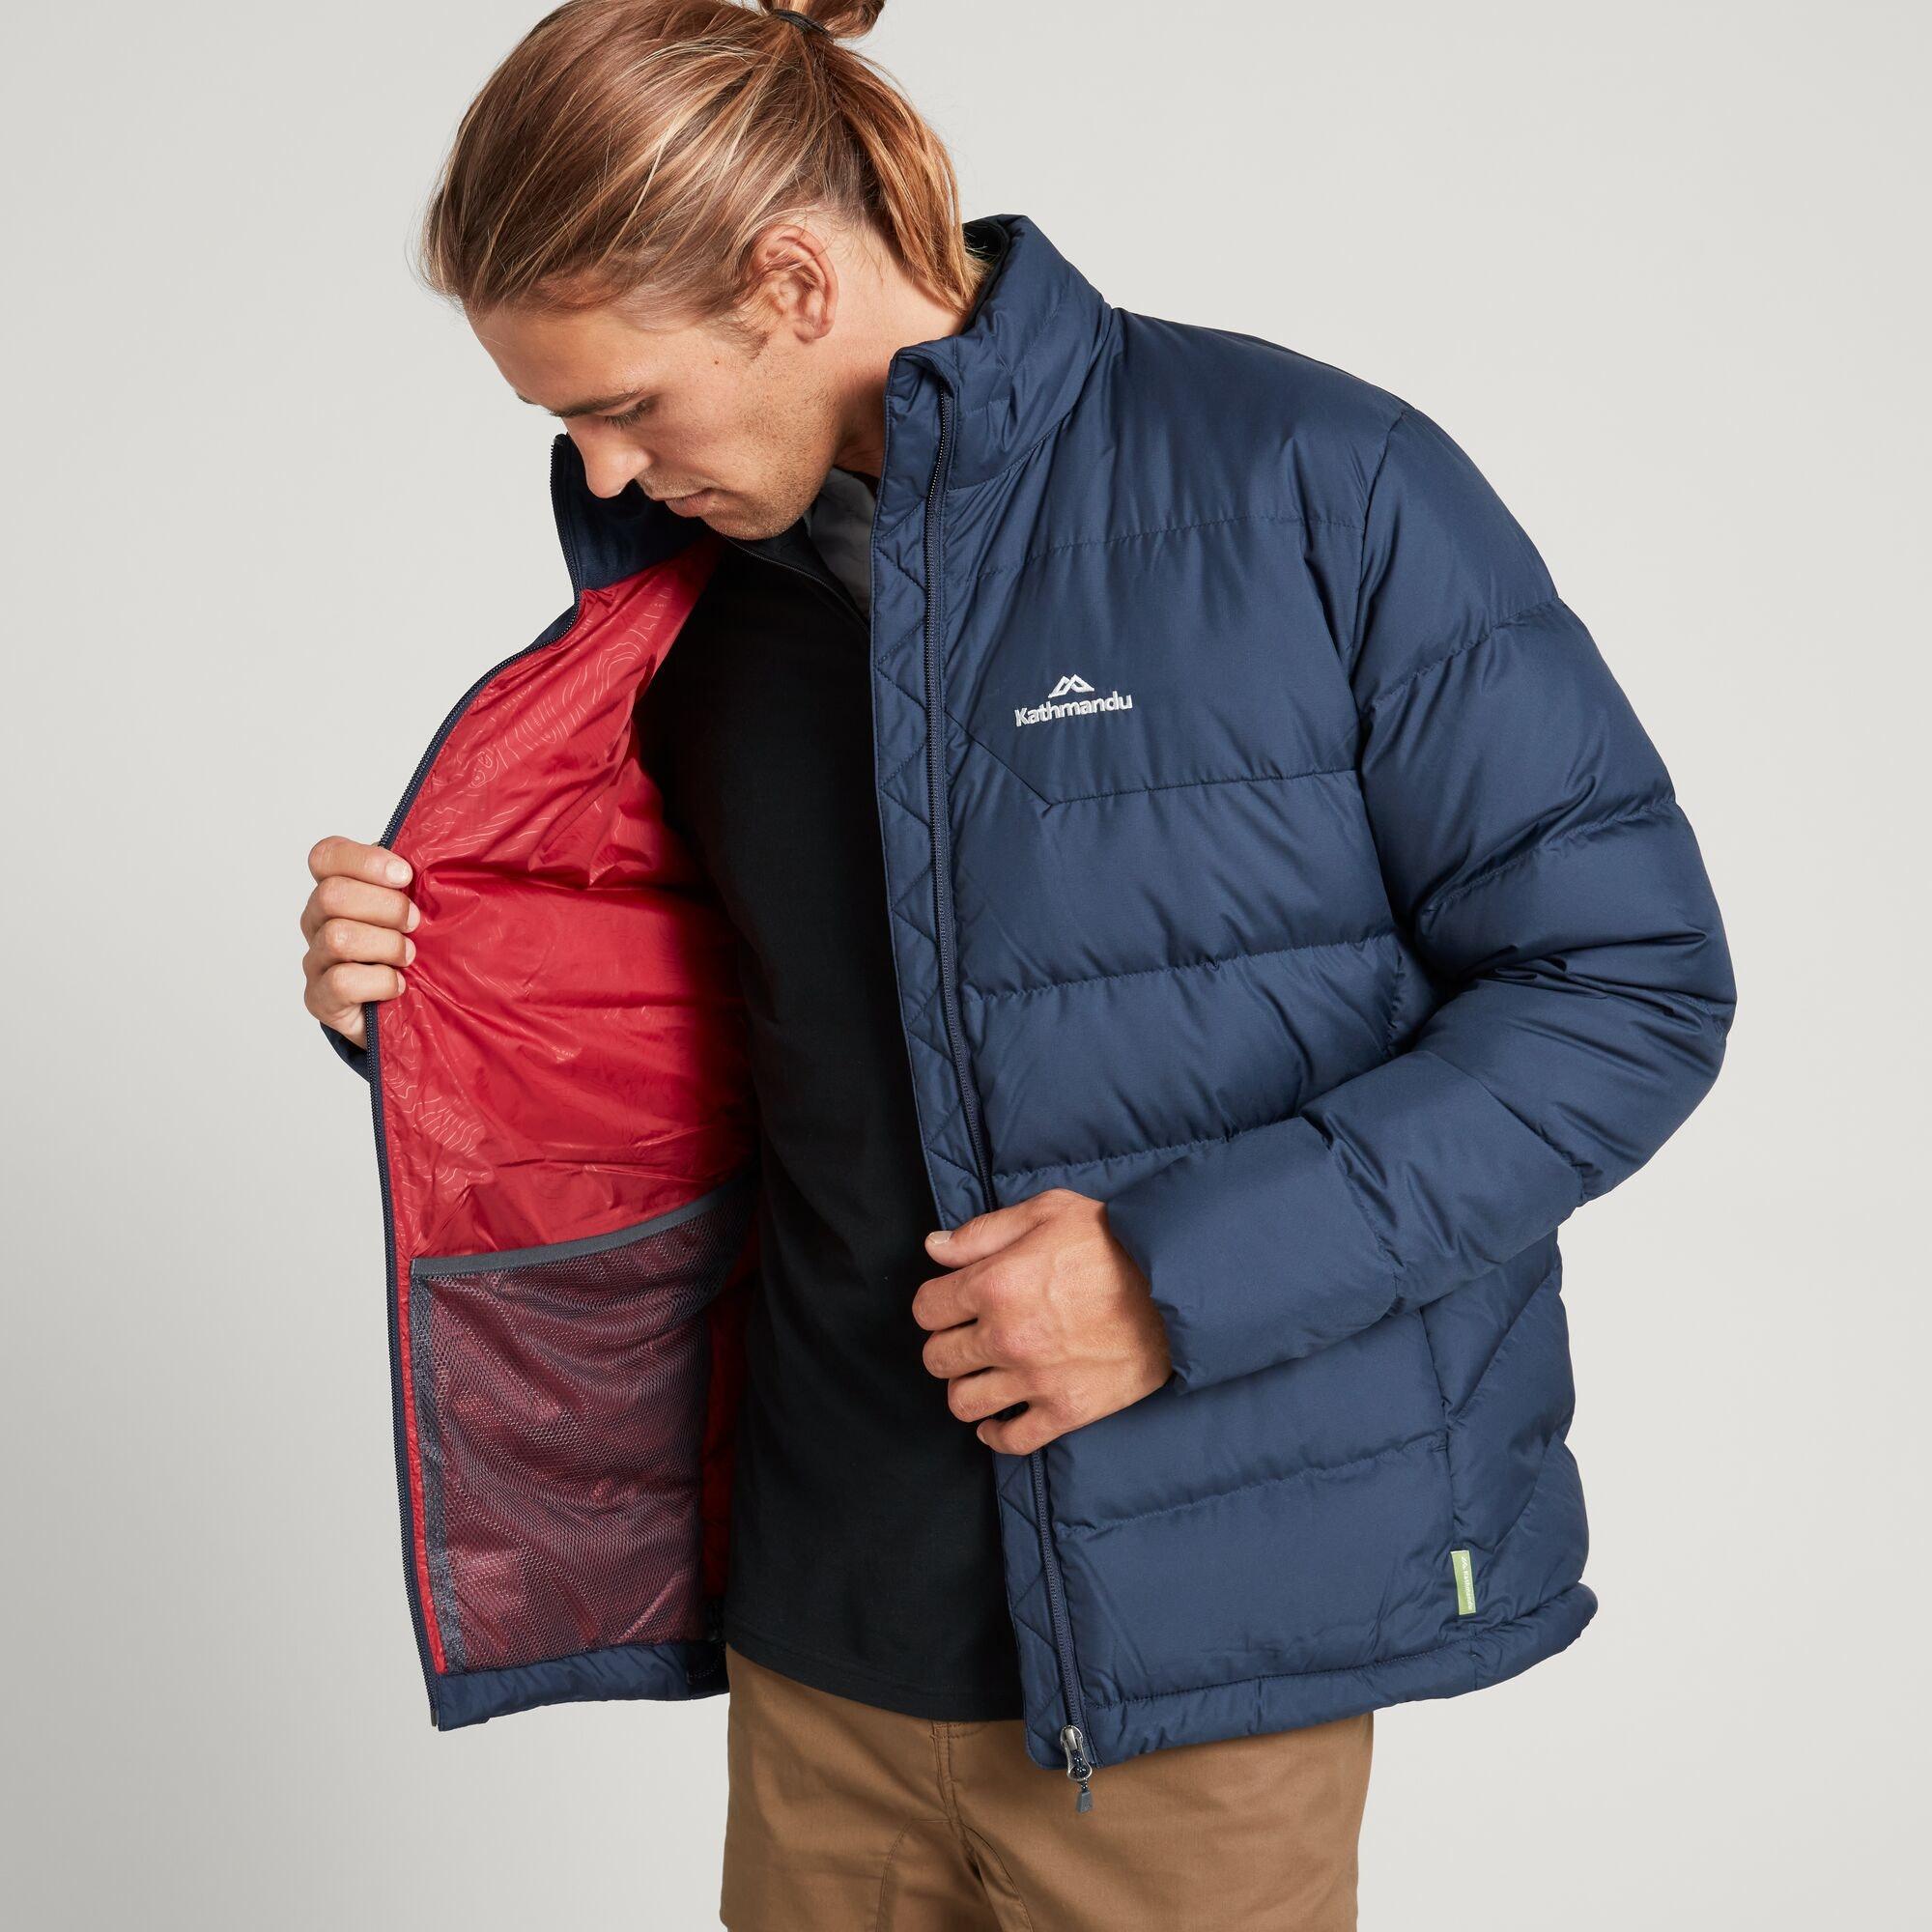 thumbnail 21 - NEW Kathmandu Epiq Mens 600 Fill Down Puffer Warm Outdoor Winter Jacket